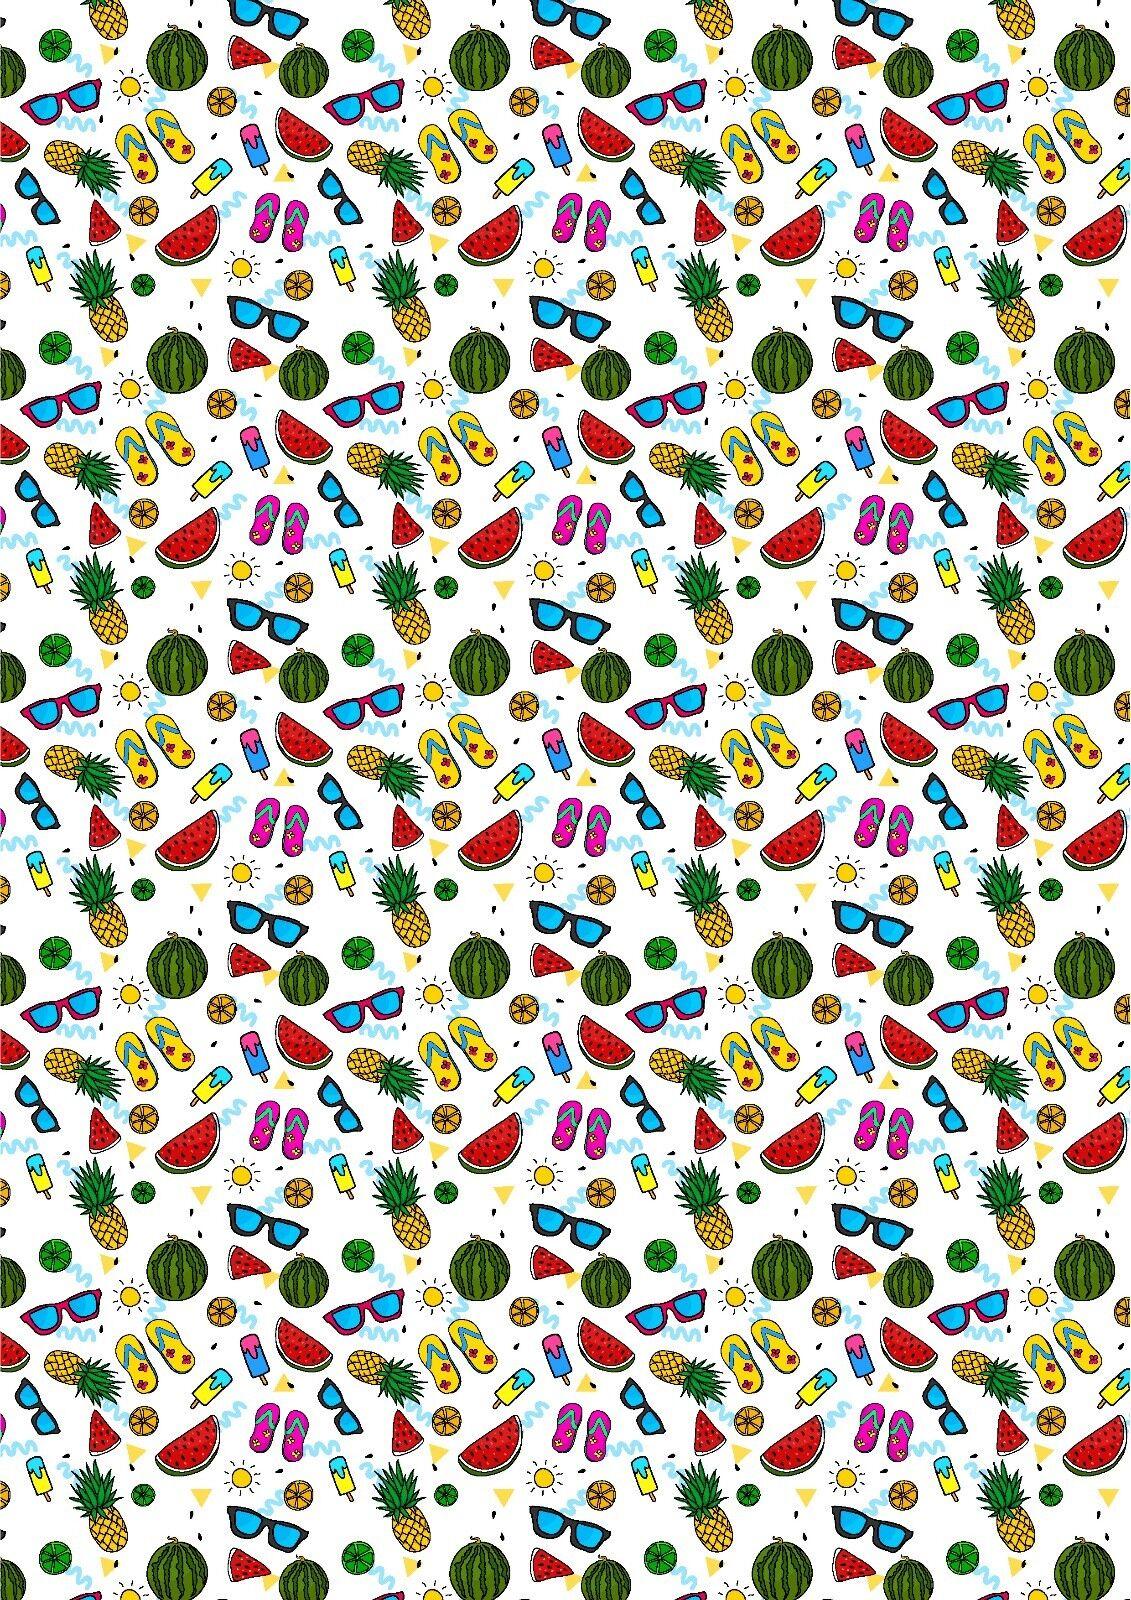 Printed Bow Fabric A4 Canvas Daisy Daisies Flowers FL1 Make glitter bow